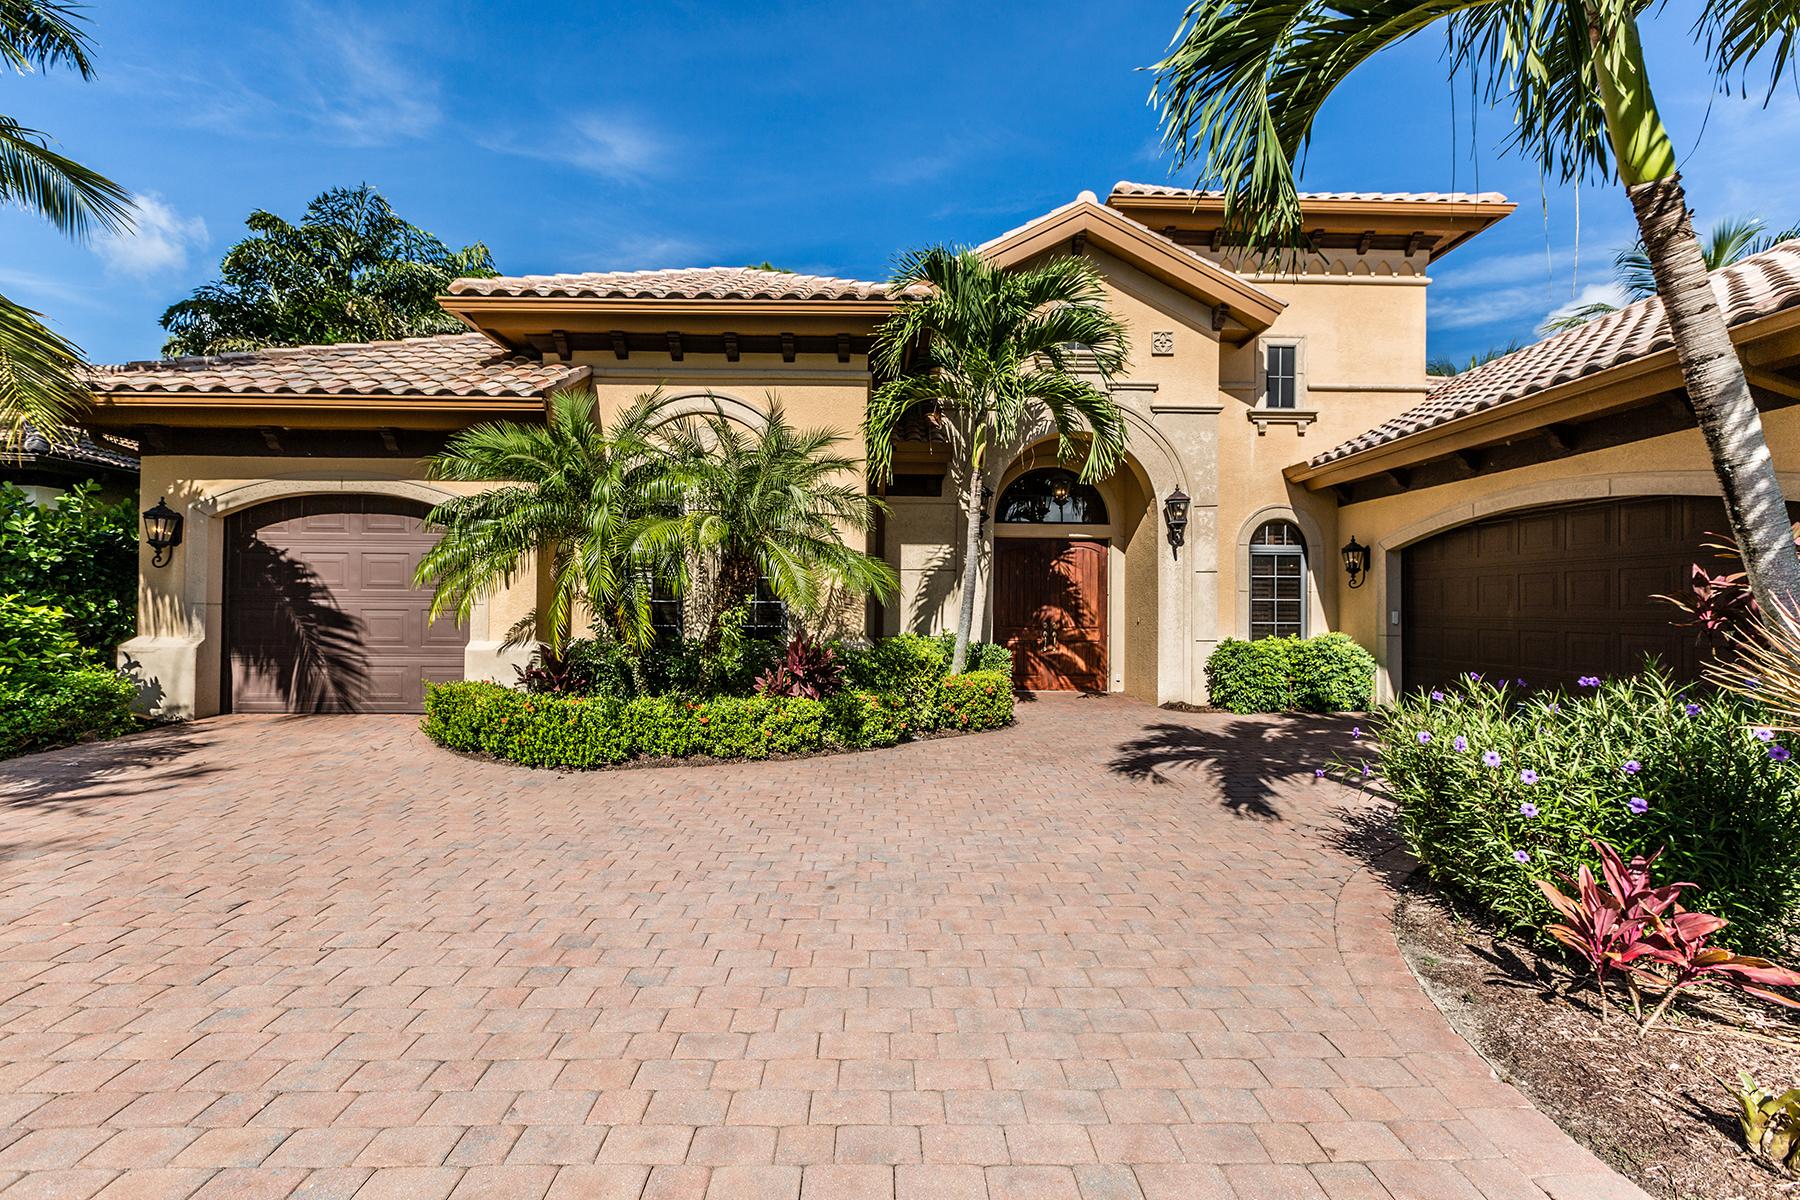 Single Family Home for Sale at LELY RESORT - MAJORS 9058 Shenendoah Cir Naples, Florida, 34113 United States